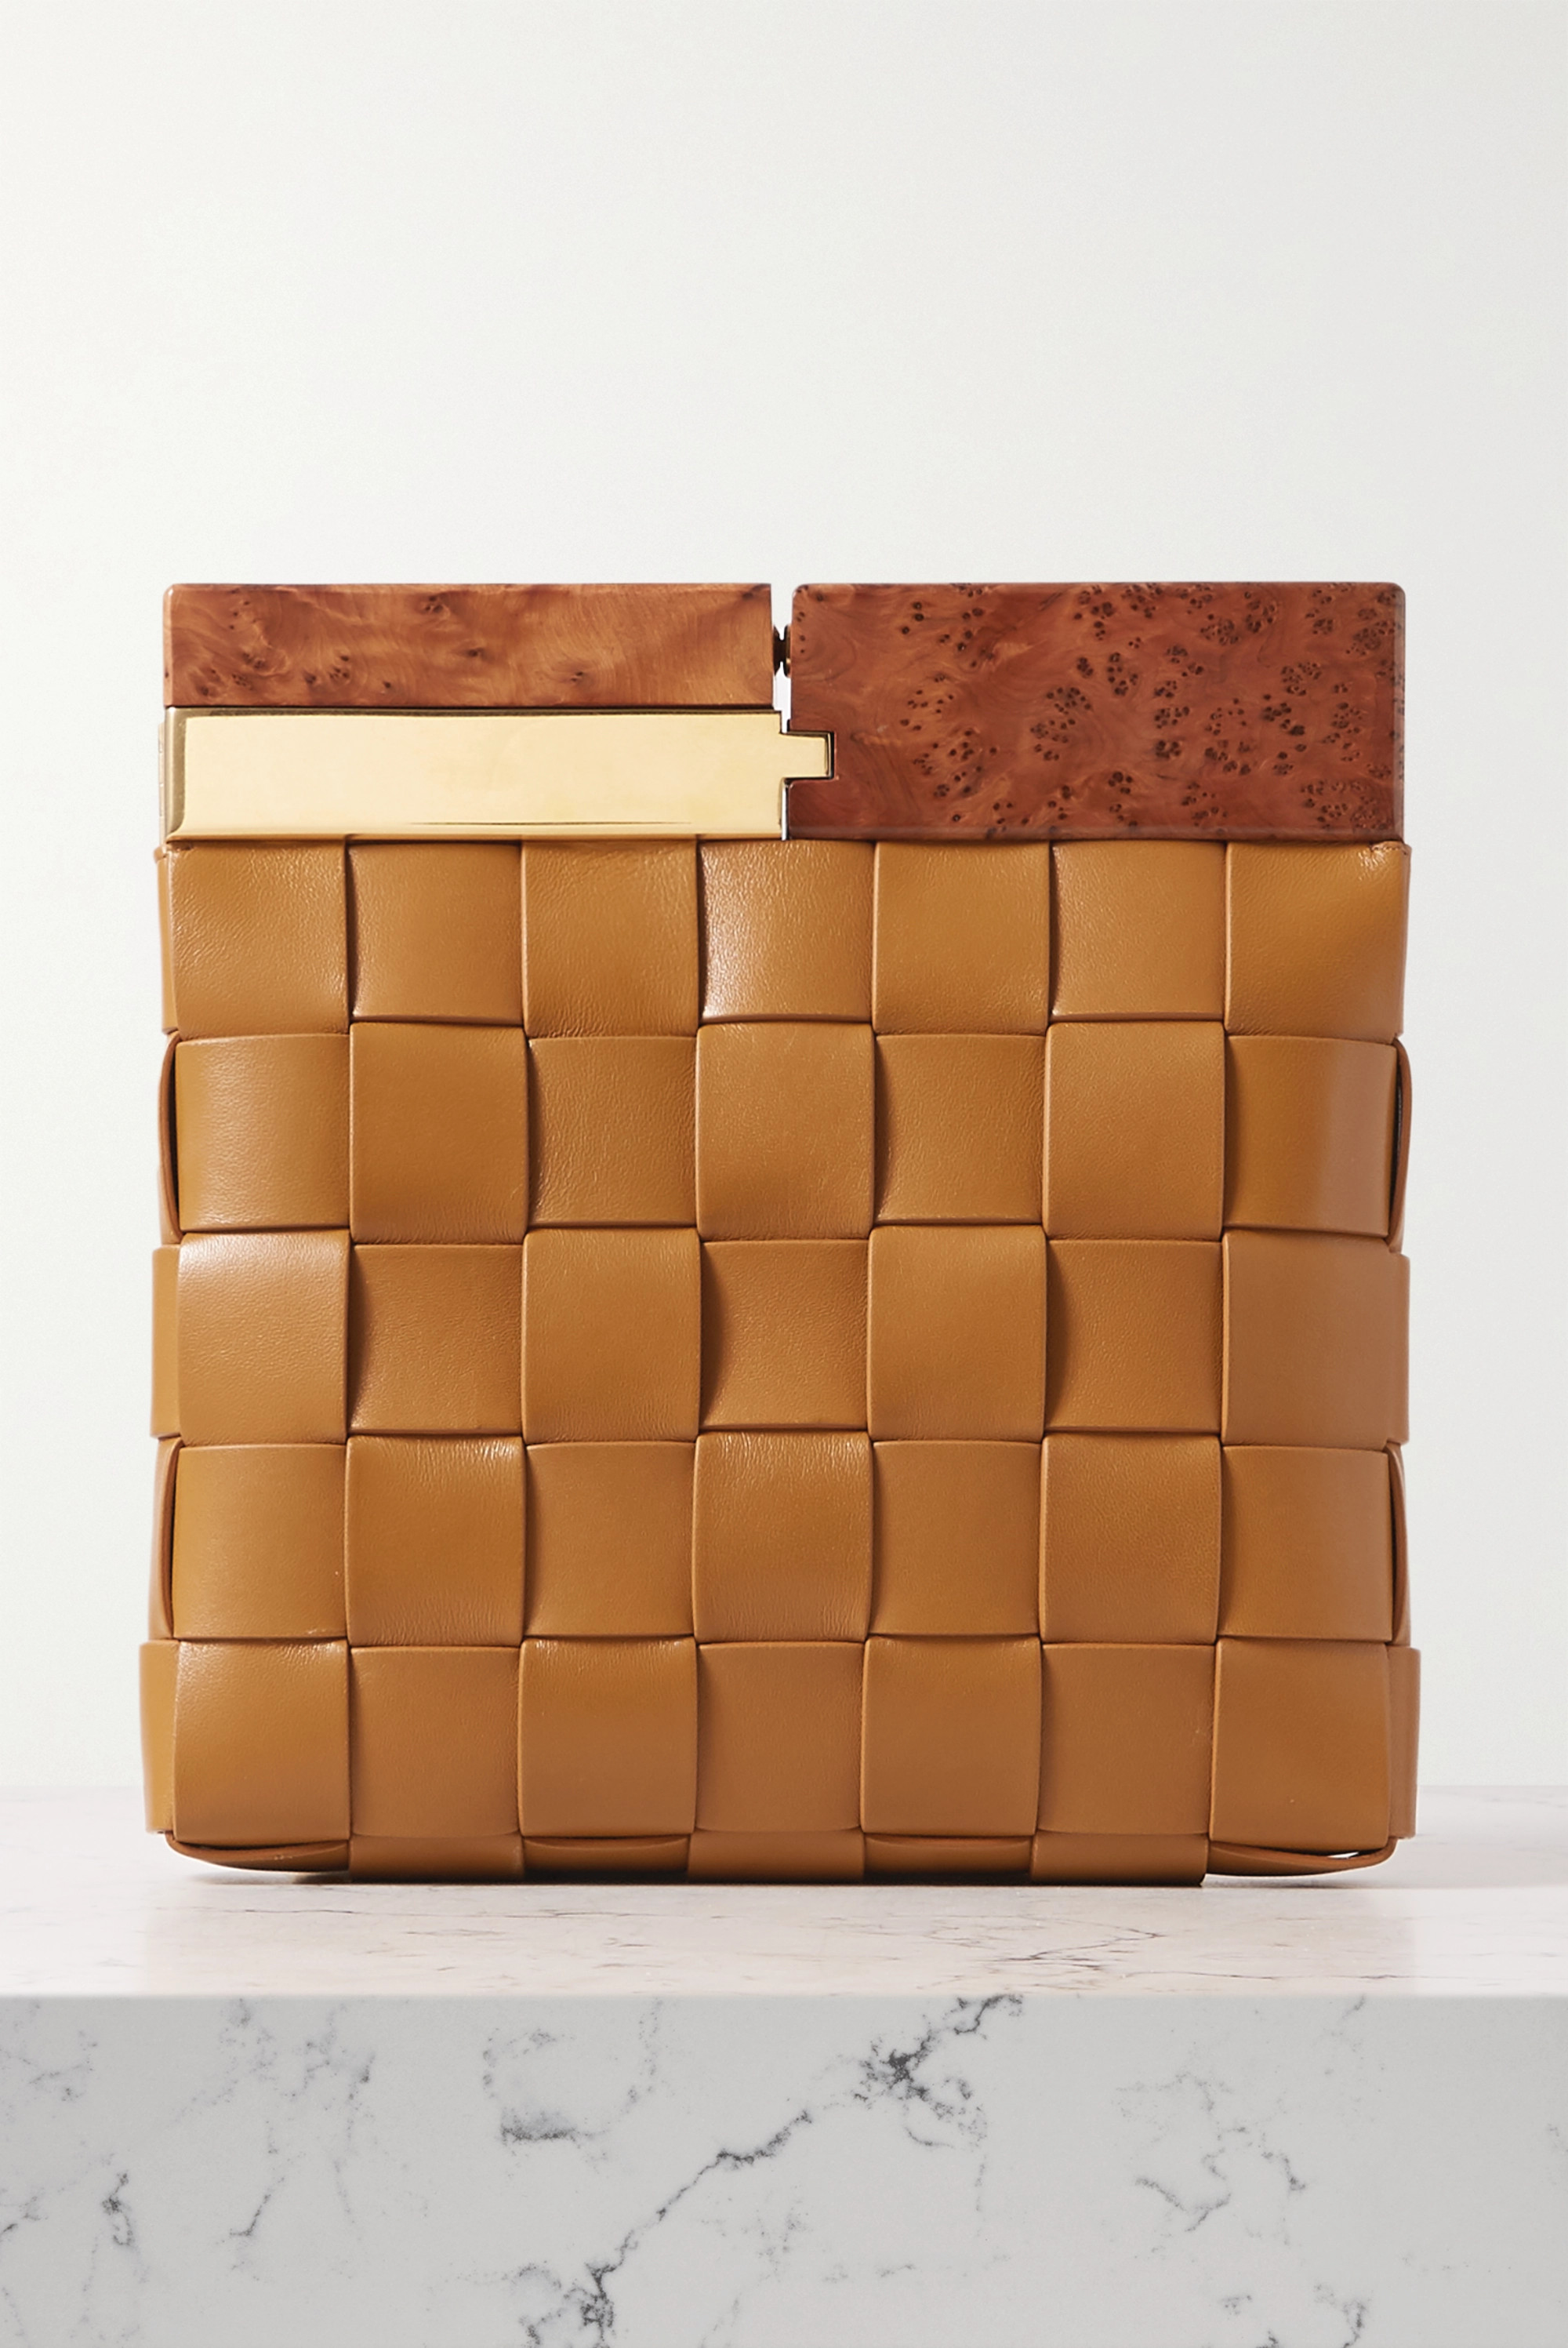 Bottega Veneta Pochette en cuir intrecciato The Snap